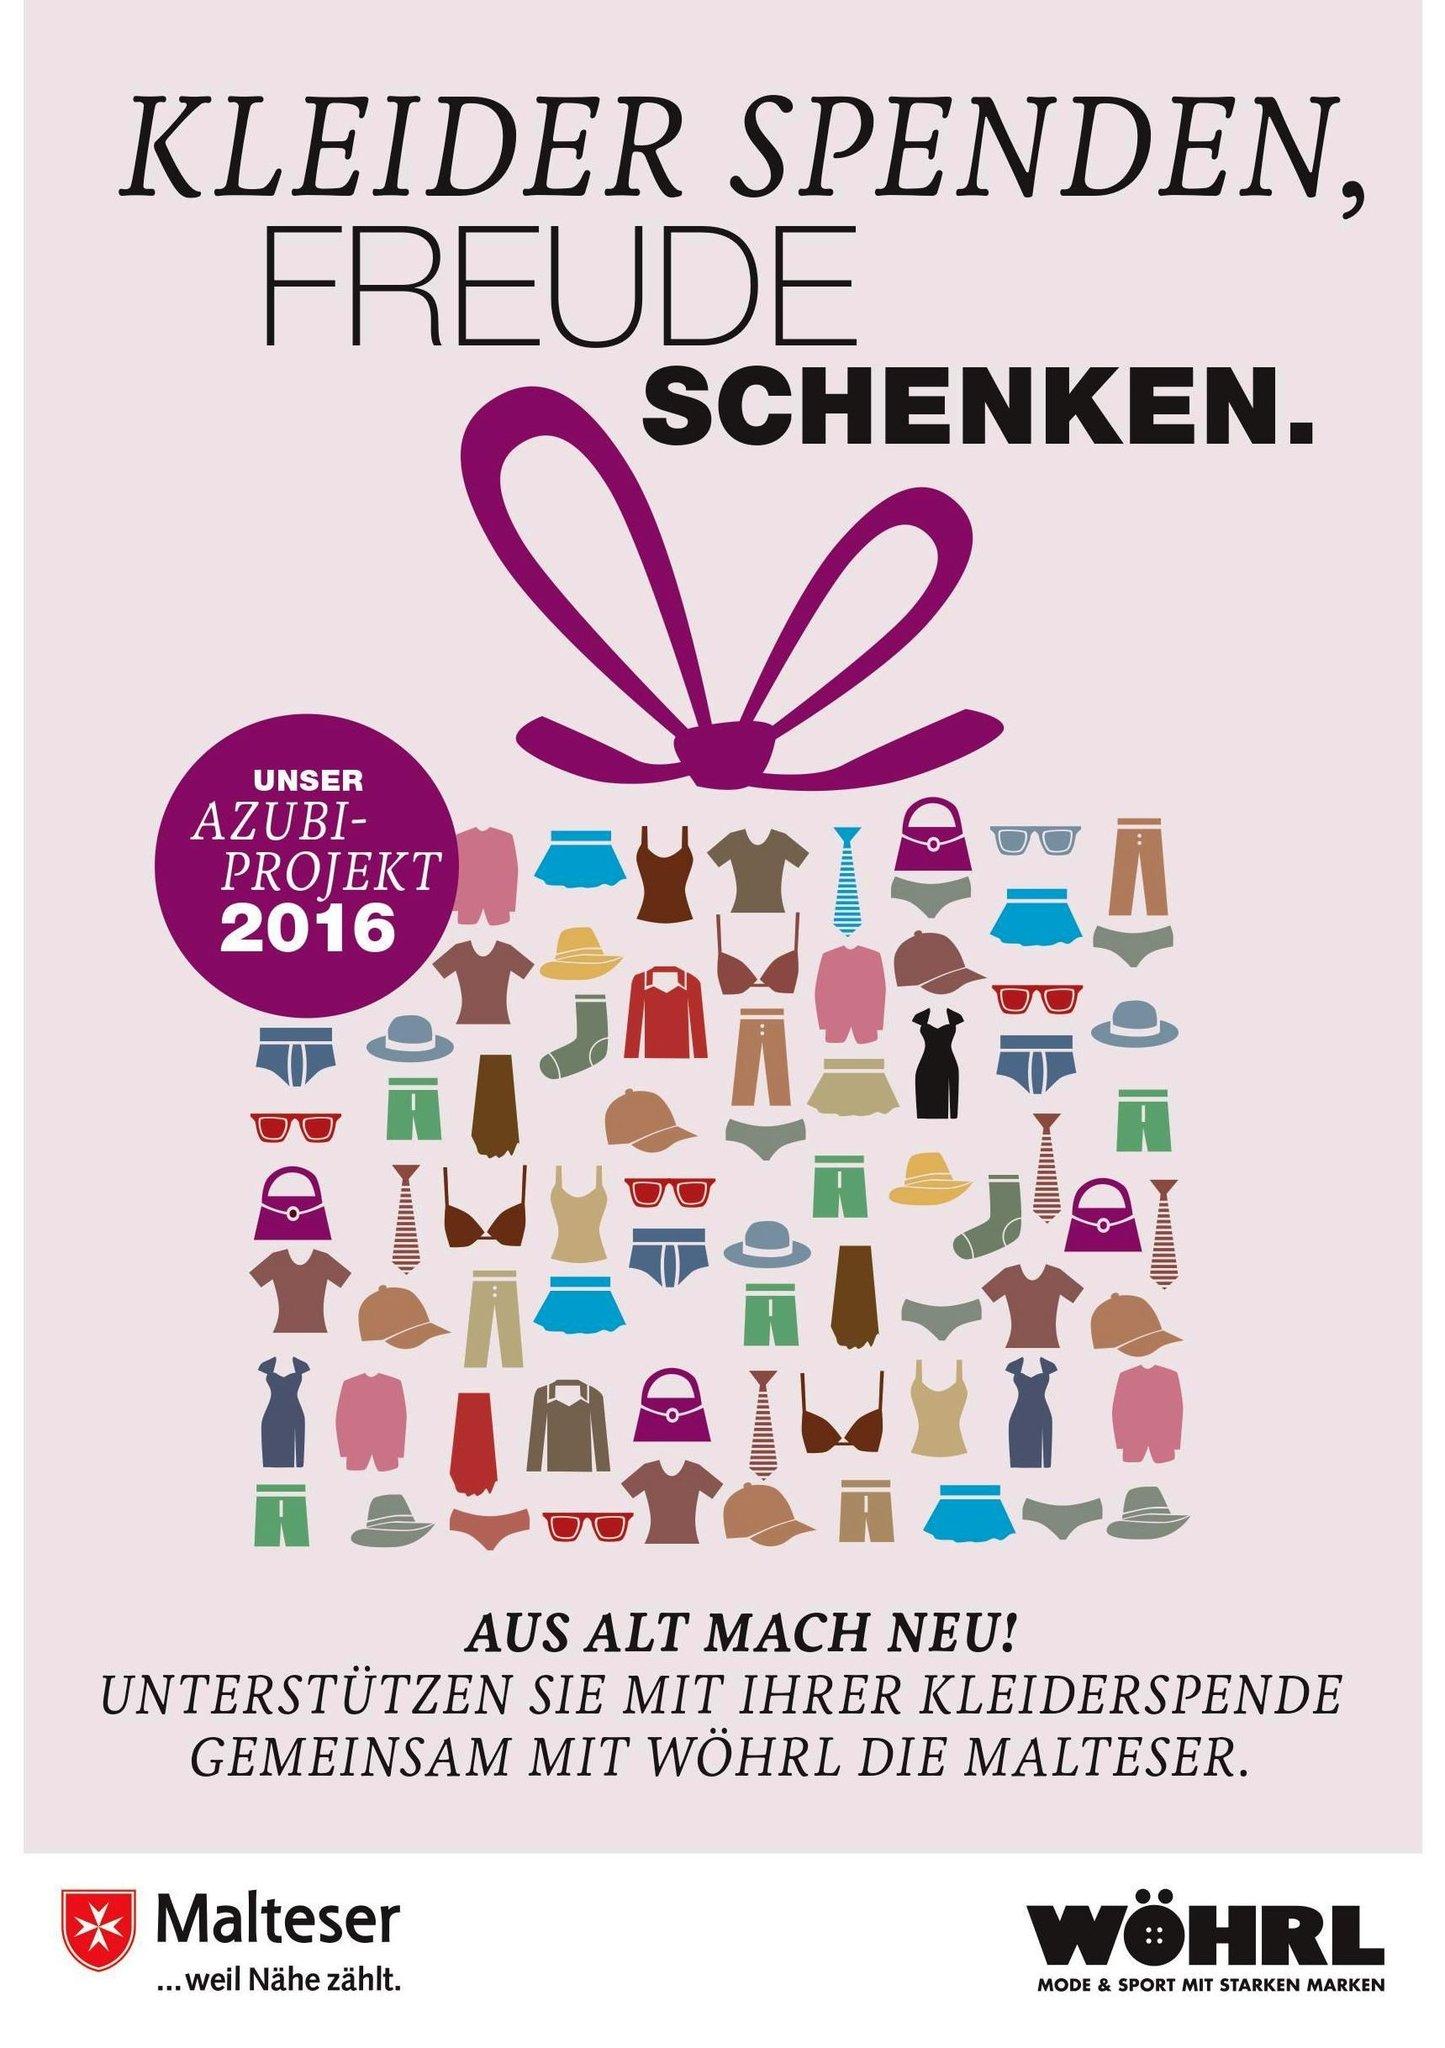 Kleider gespendet – Freude geschenkt - Nürnberg